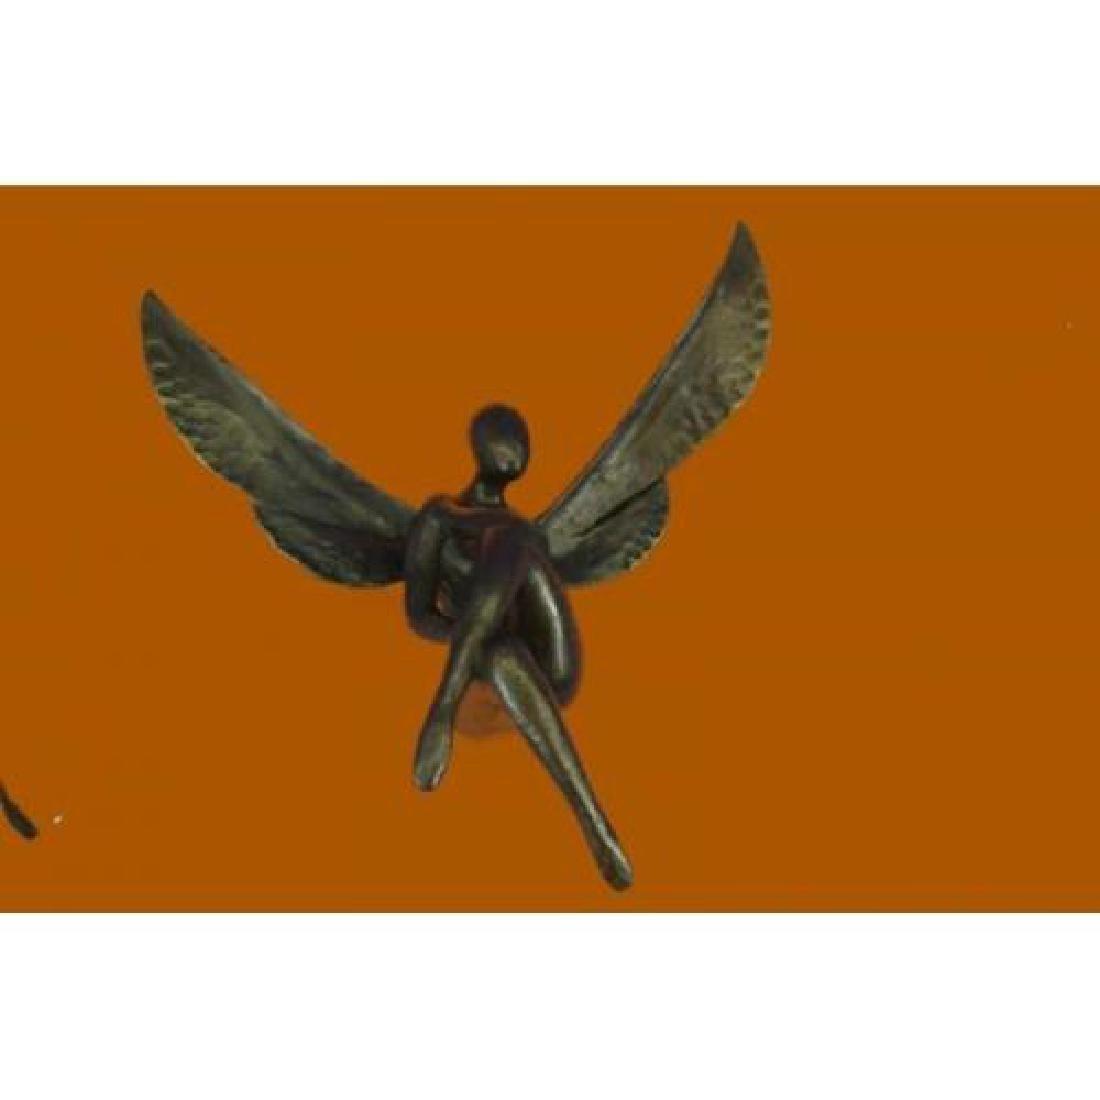 Wall Mount Sitting Angel Bronze Sculpture